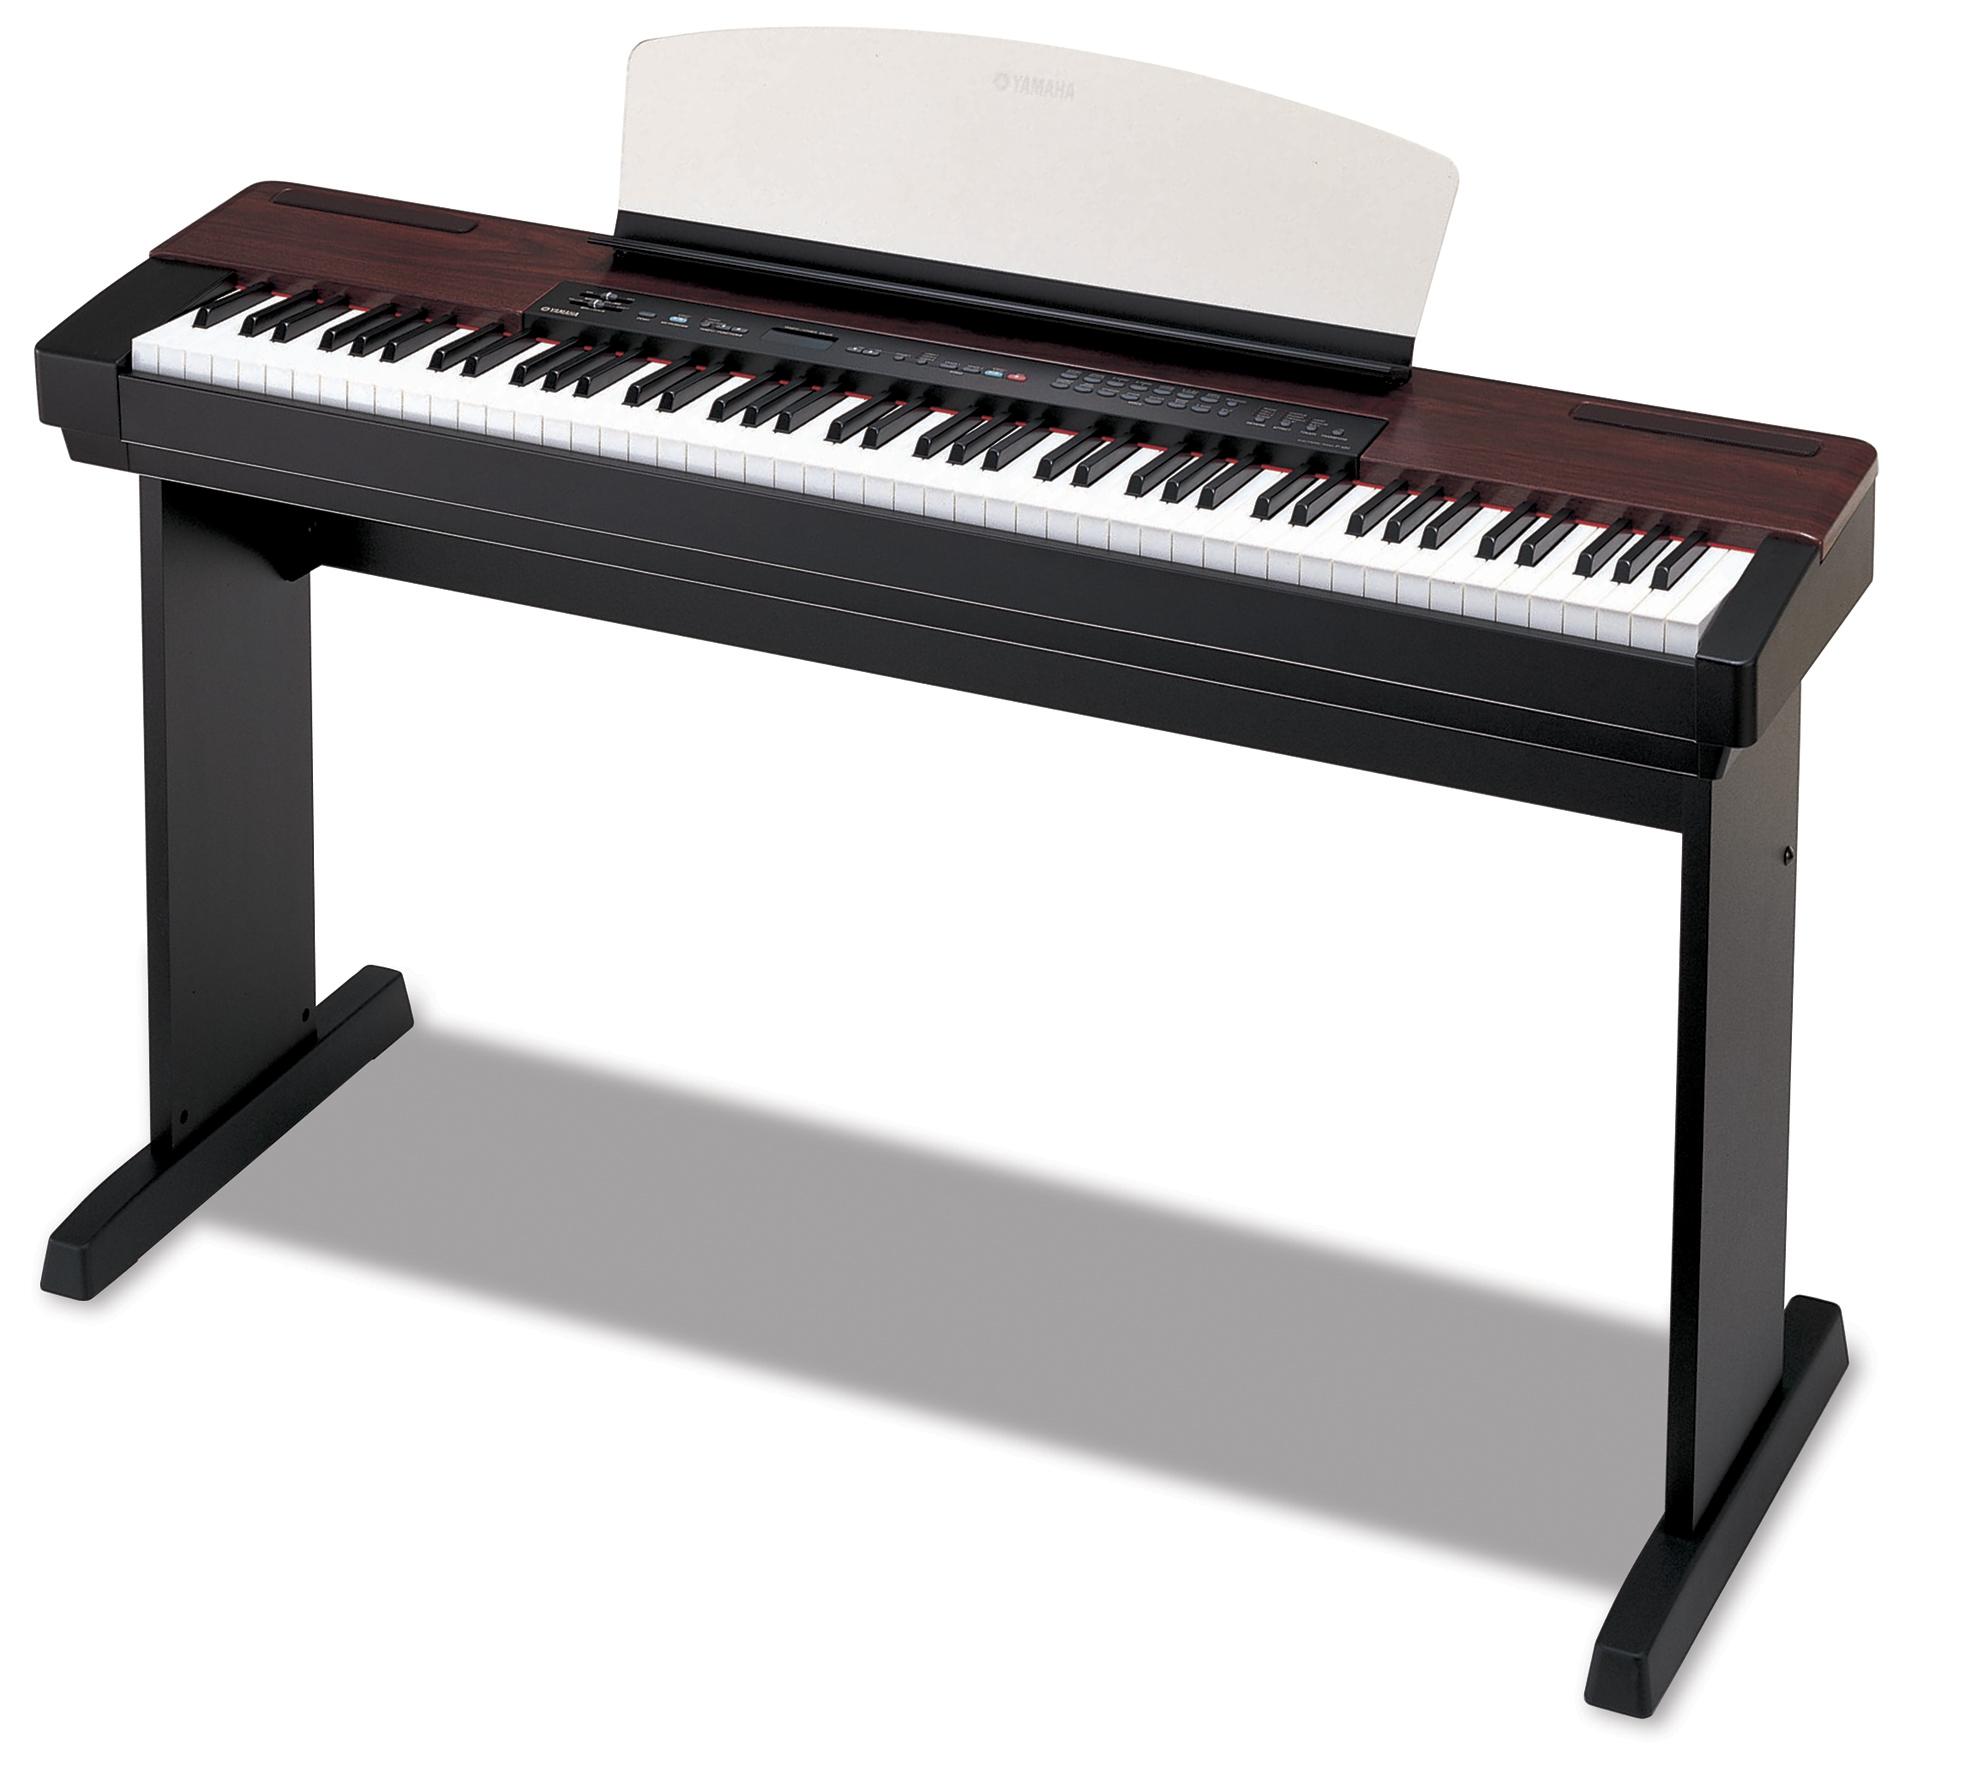 yamaha digital pianos for home. Black Bedroom Furniture Sets. Home Design Ideas